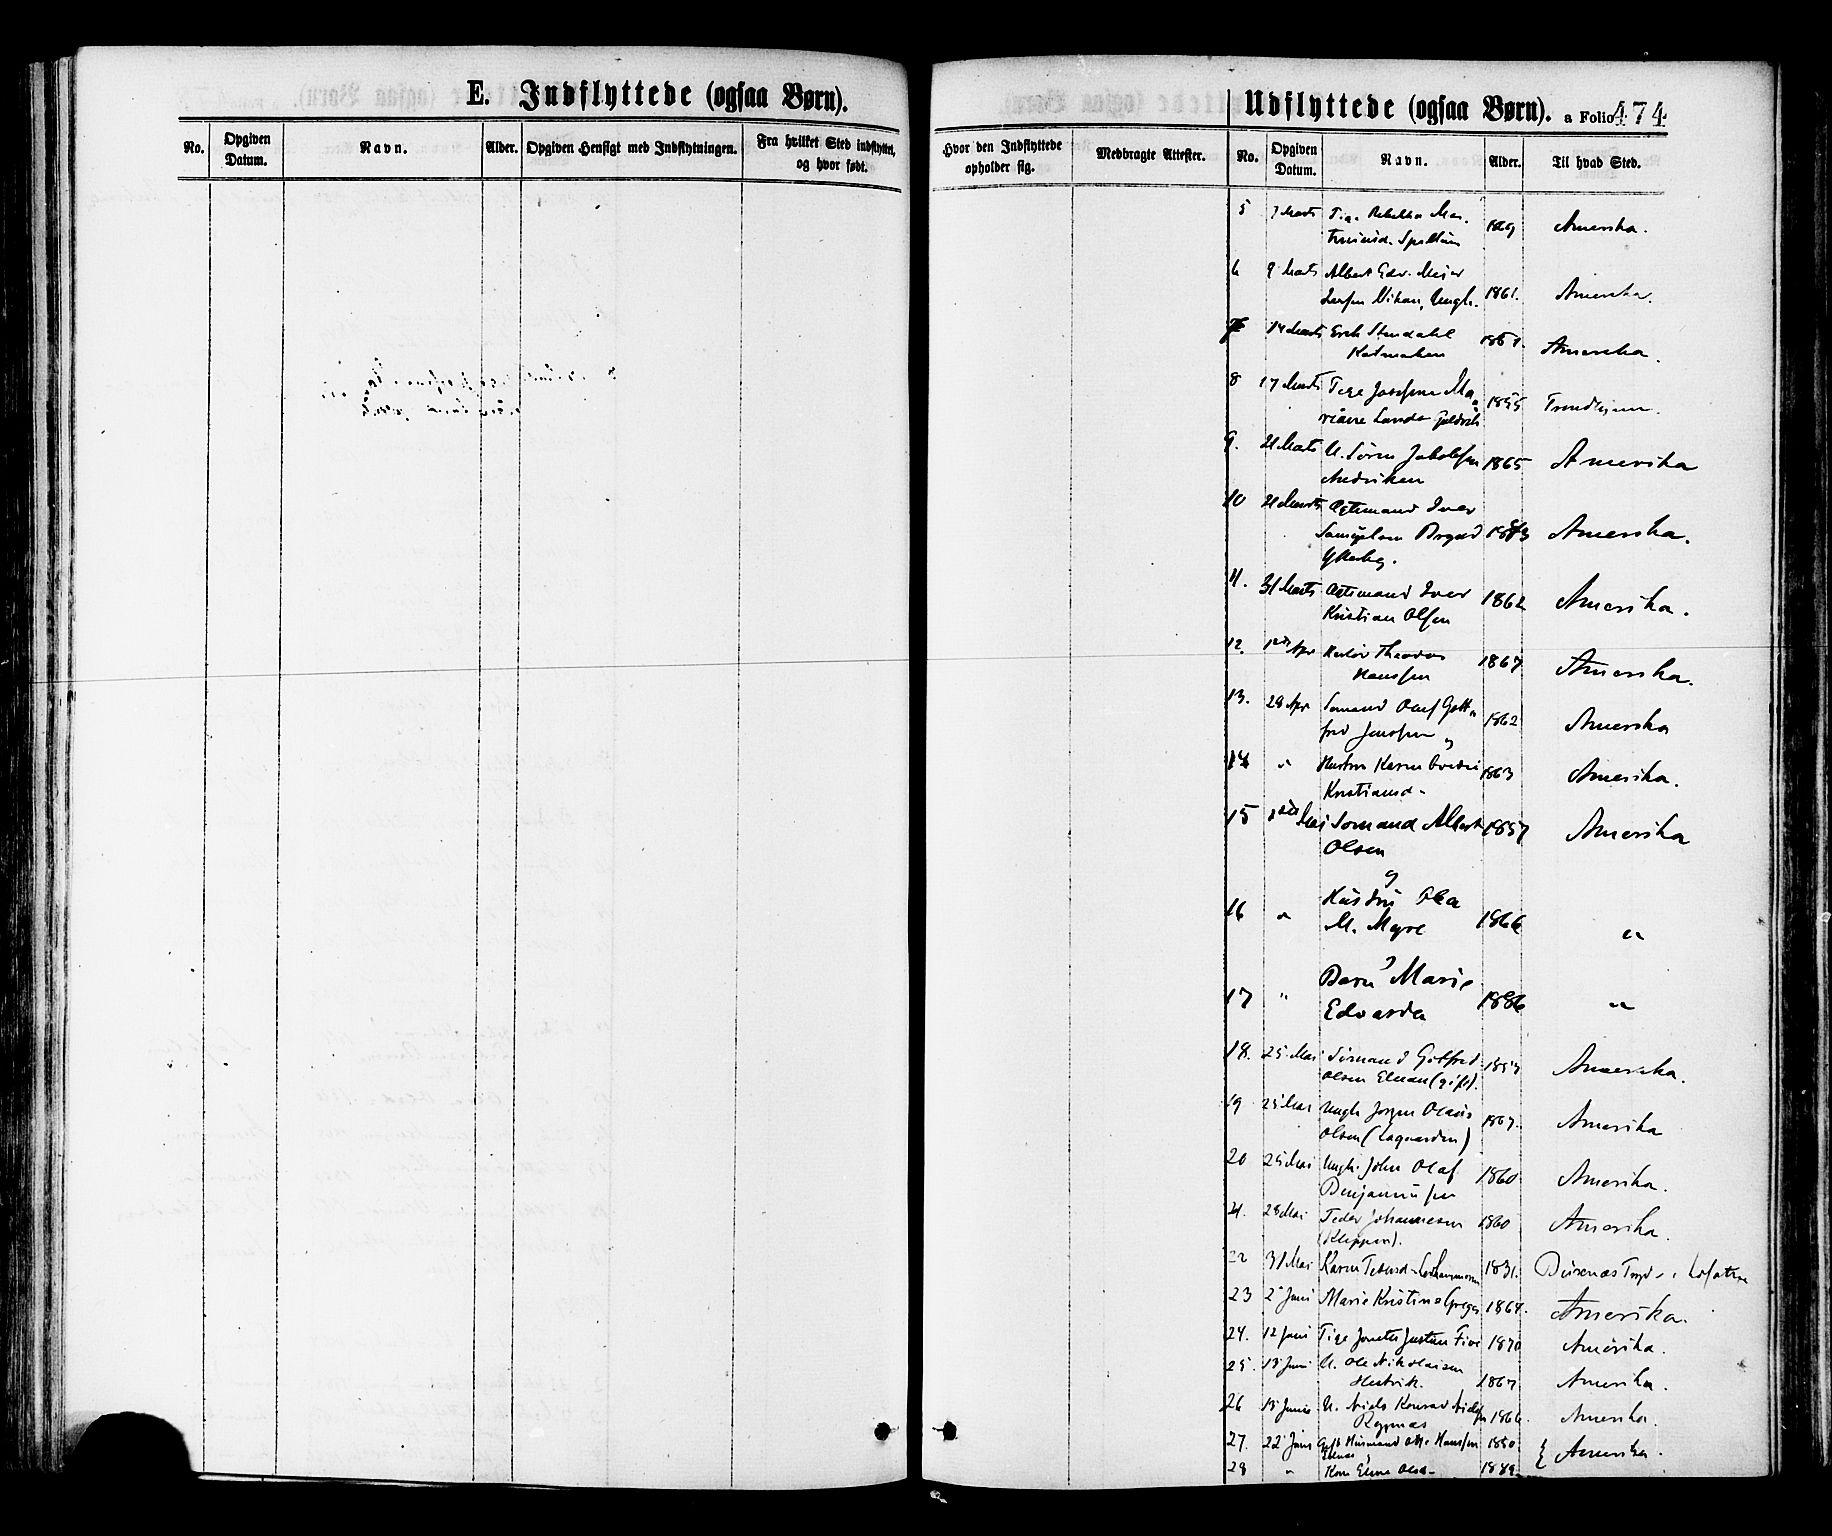 SAT, Ministerialprotokoller, klokkerbøker og fødselsregistre - Nord-Trøndelag, 768/L0572: Ministerialbok nr. 768A07, 1874-1886, s. 474a